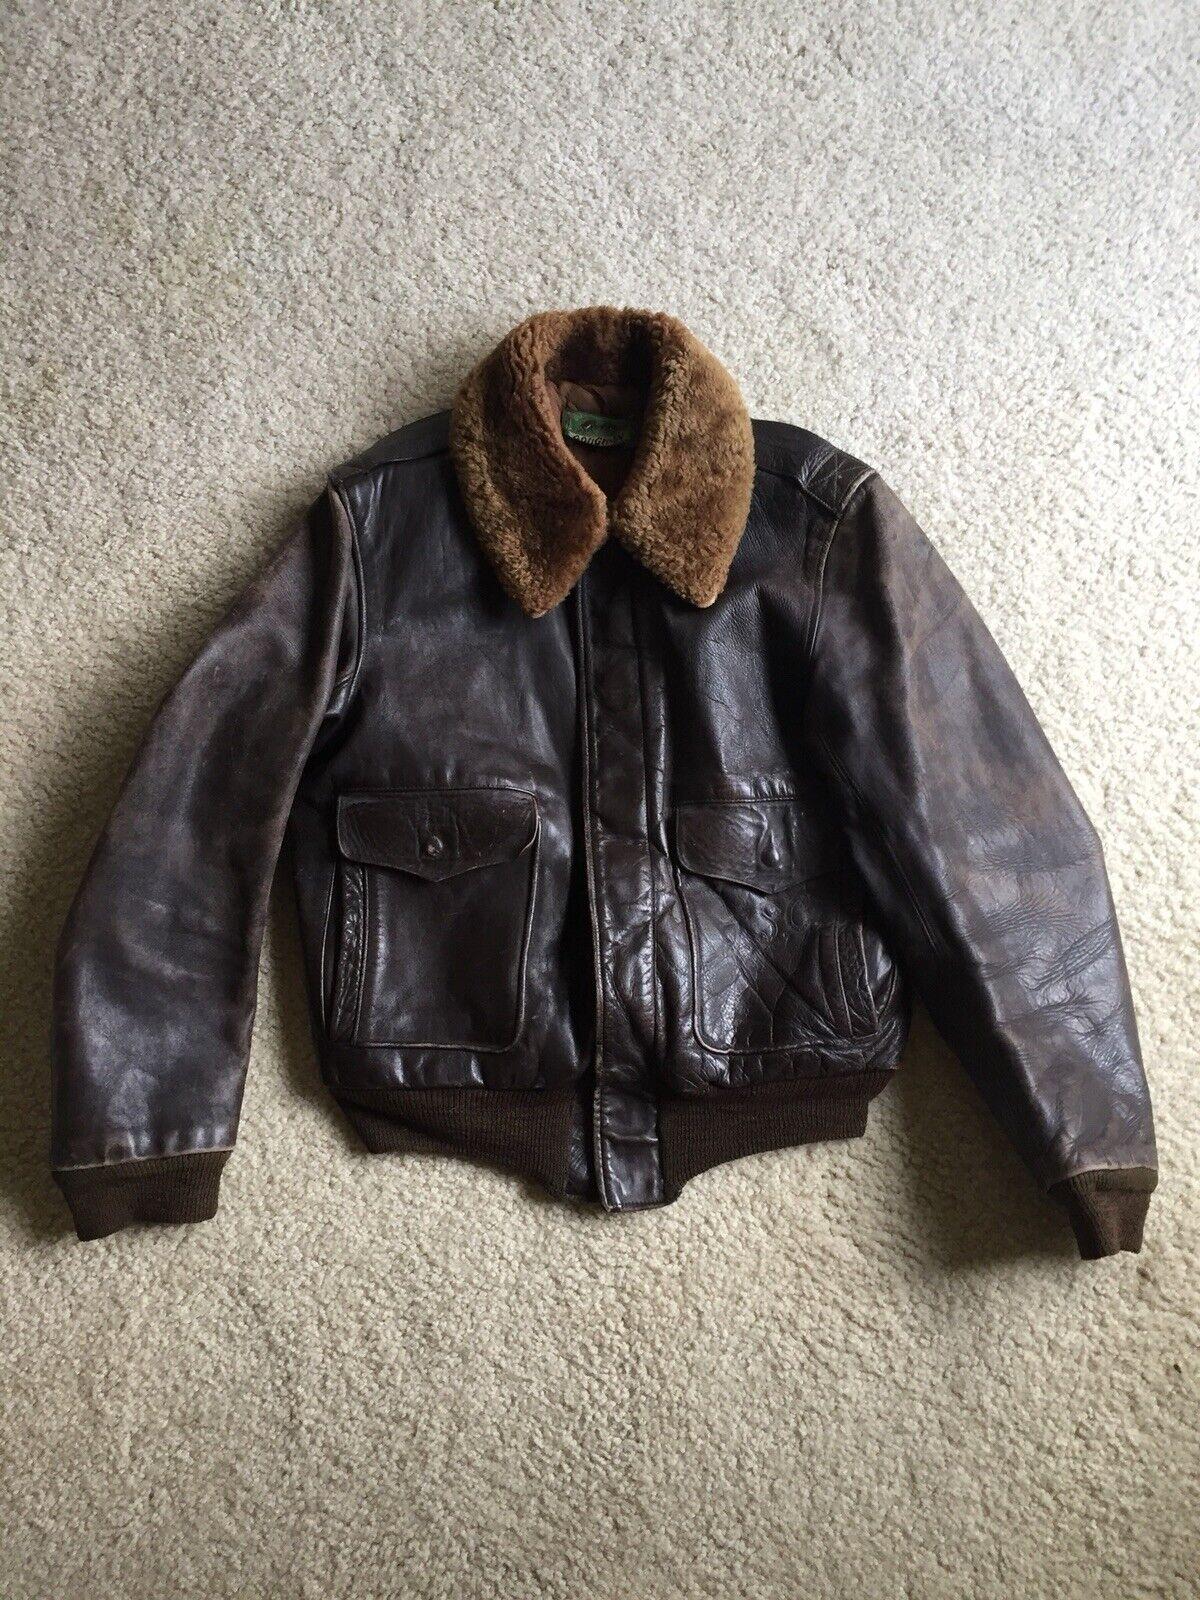 Vintage Rough Wear Rough-In Front Quarter Horsehide Leather Jacket